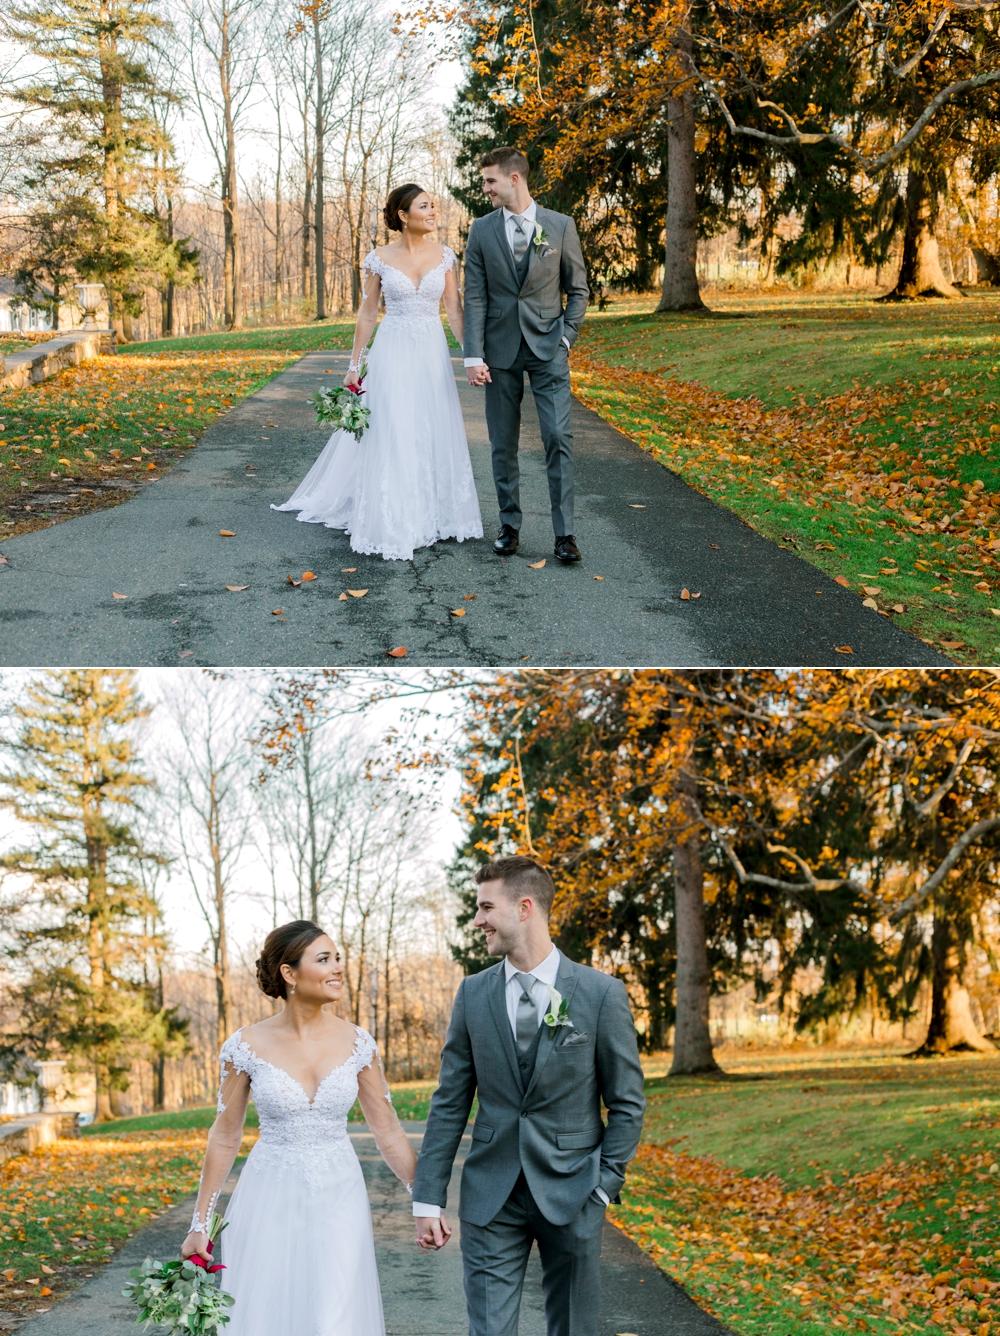 SomerbyJonesPhotography__PierceFarmWedding_PierceFarm_PierceFarmAtWitchHill_0022.jpg